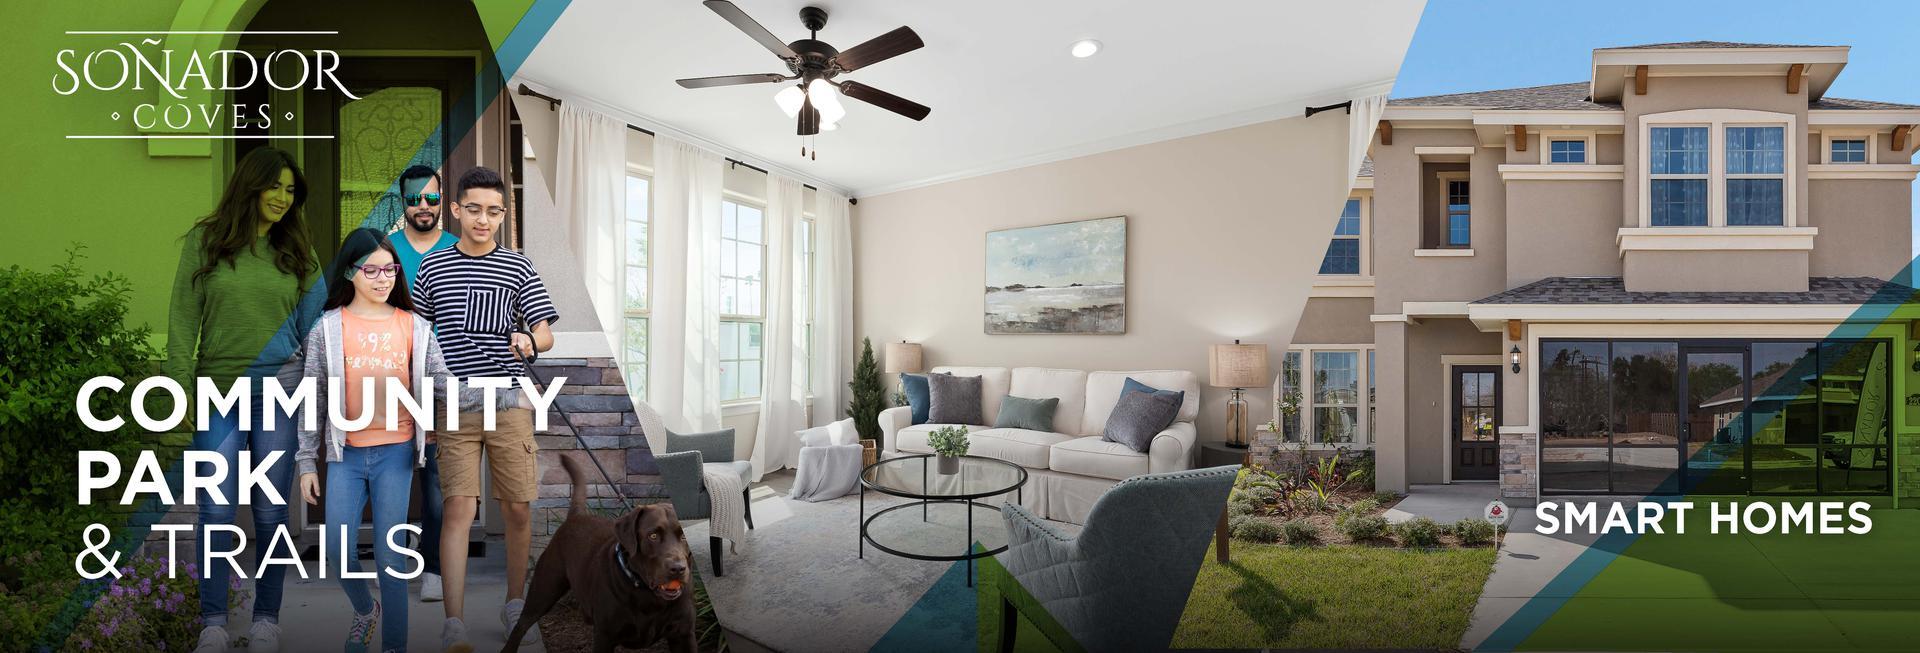 Soñador Coves New Homes in Edinburg , TX